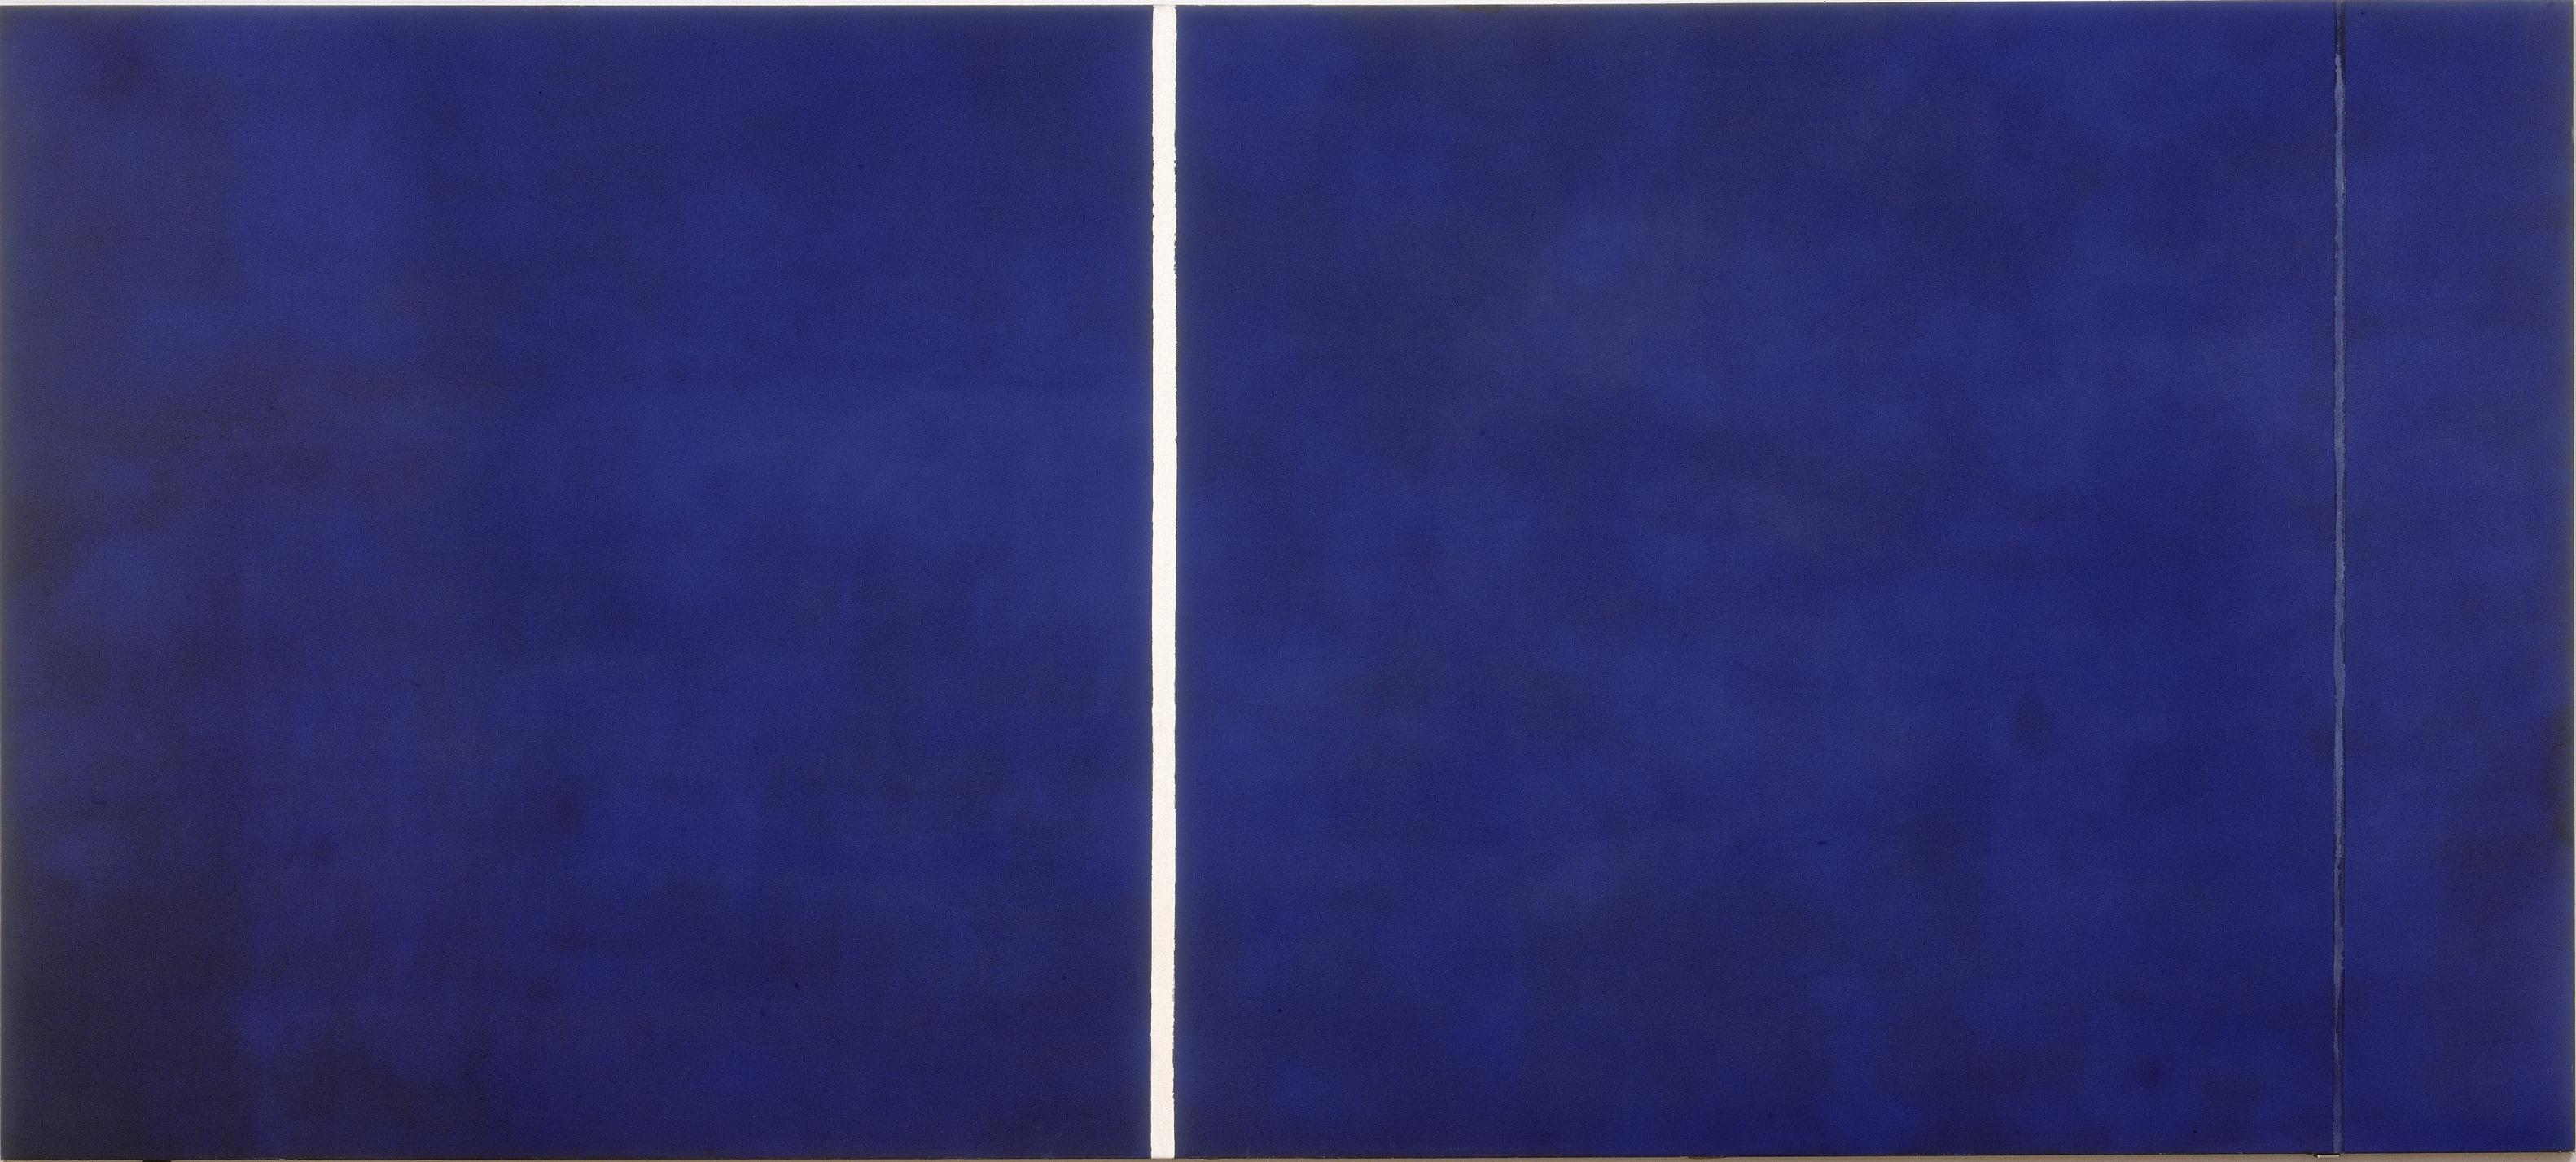 Cathedra, Barnett Newman